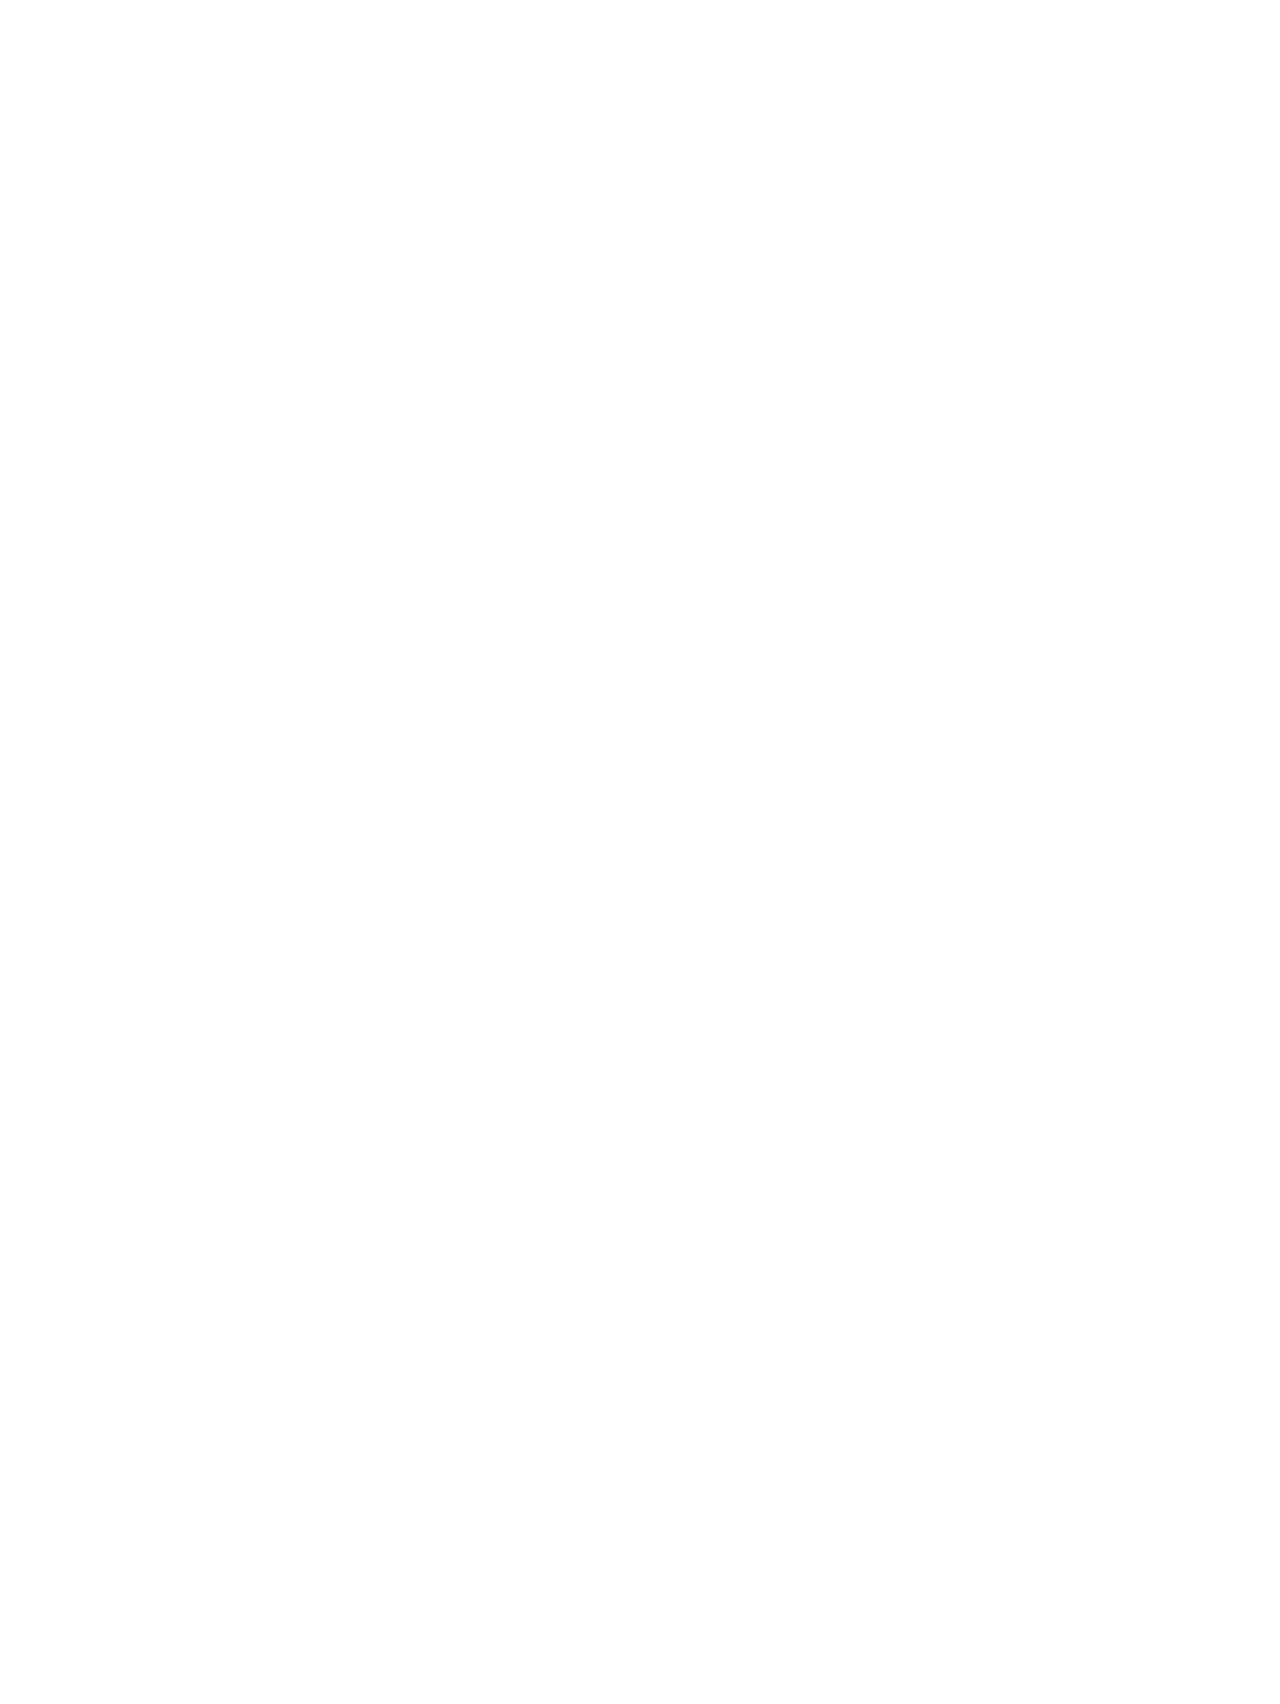 https://digital.tessmann.it/mediaArchive/media/image/Page/SNL/1965/01_07_1965/SNL_1965_07_01_3_object_2135729.png?auth=27241c81555ef24e04d21c3d631e3b85